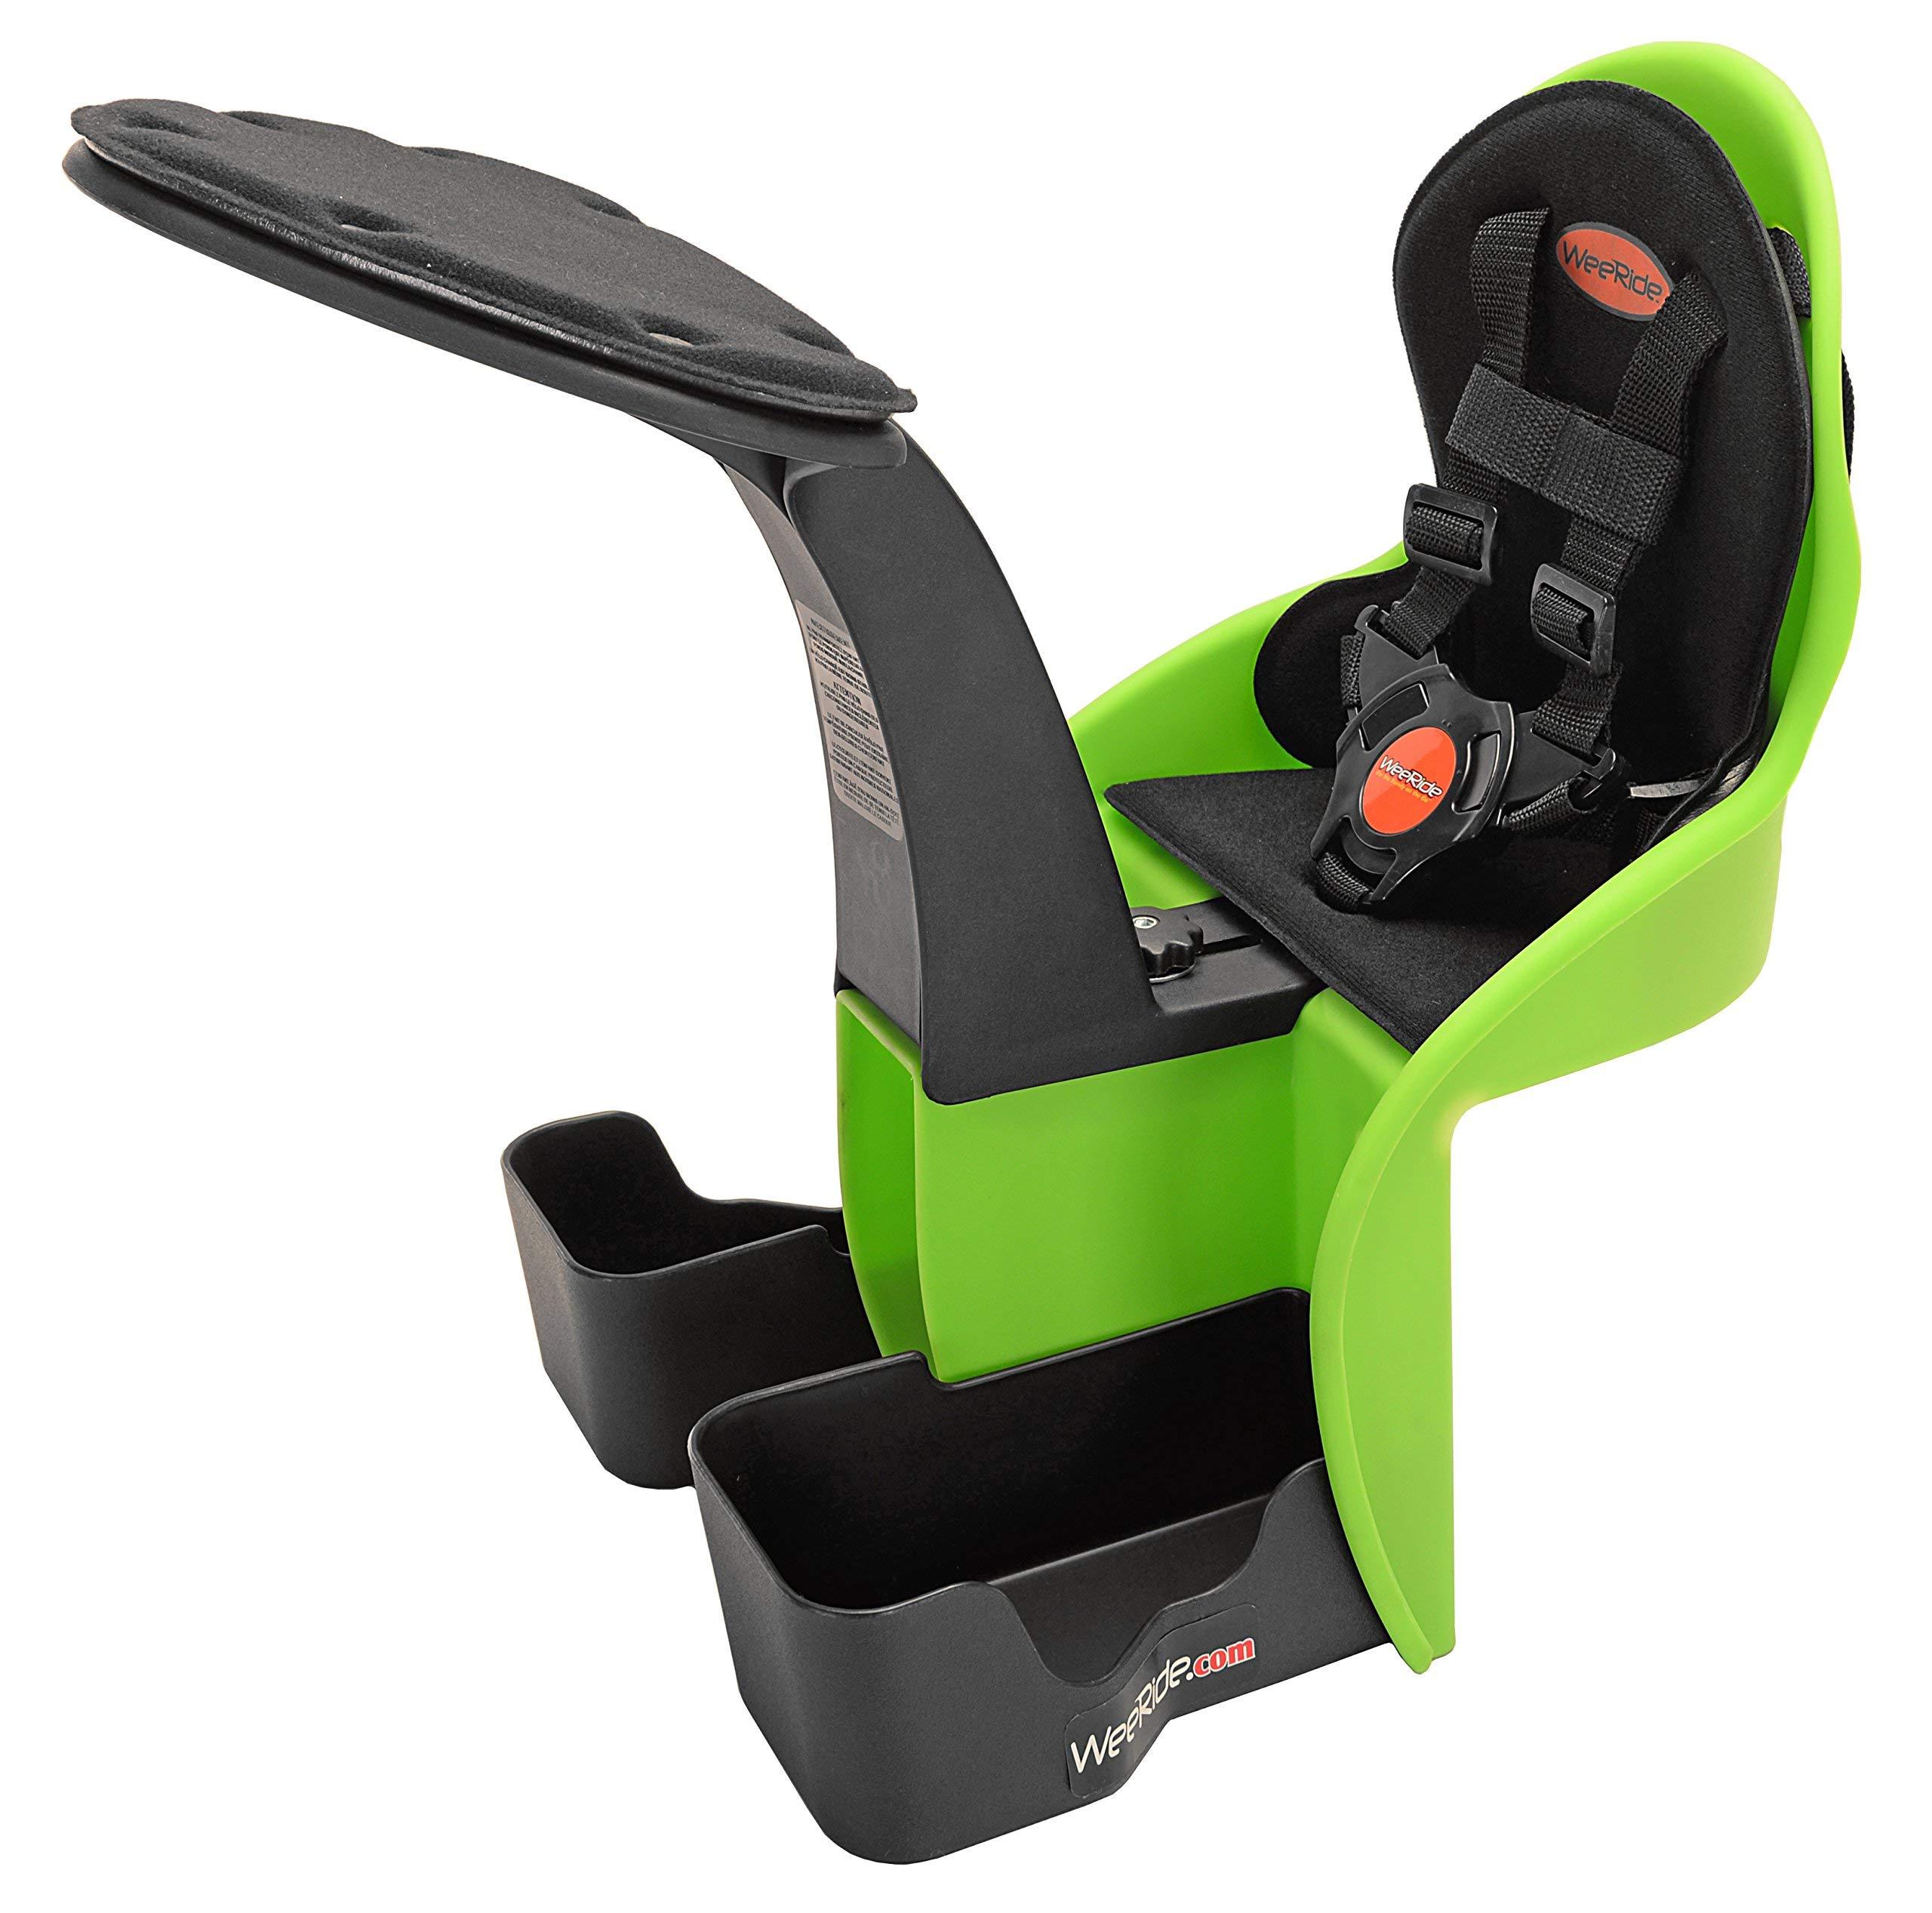 WeeRide Kangaroo Child Bike Seat, Green (Renewed)